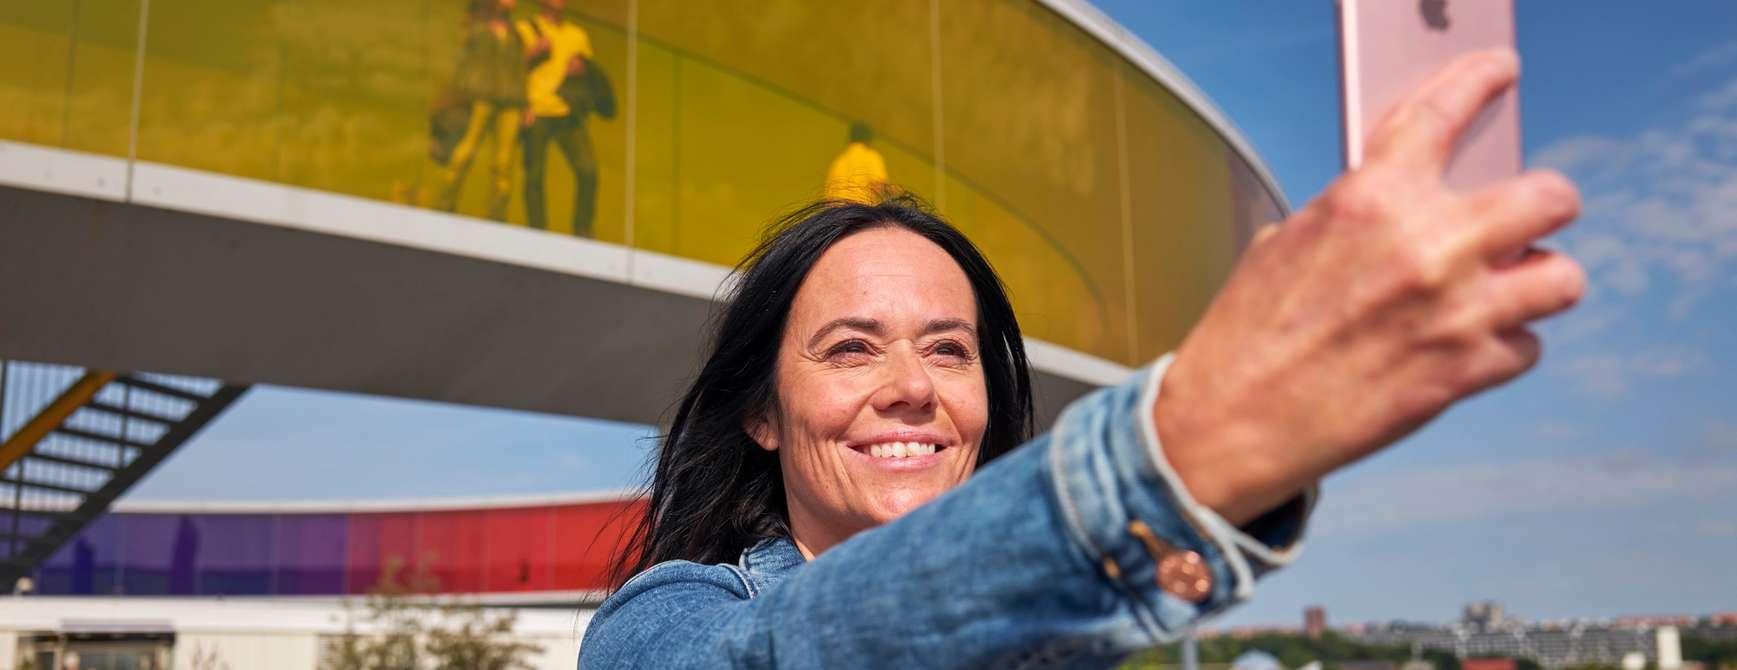 Jente tar selfie utenfor ARos i Aarhus